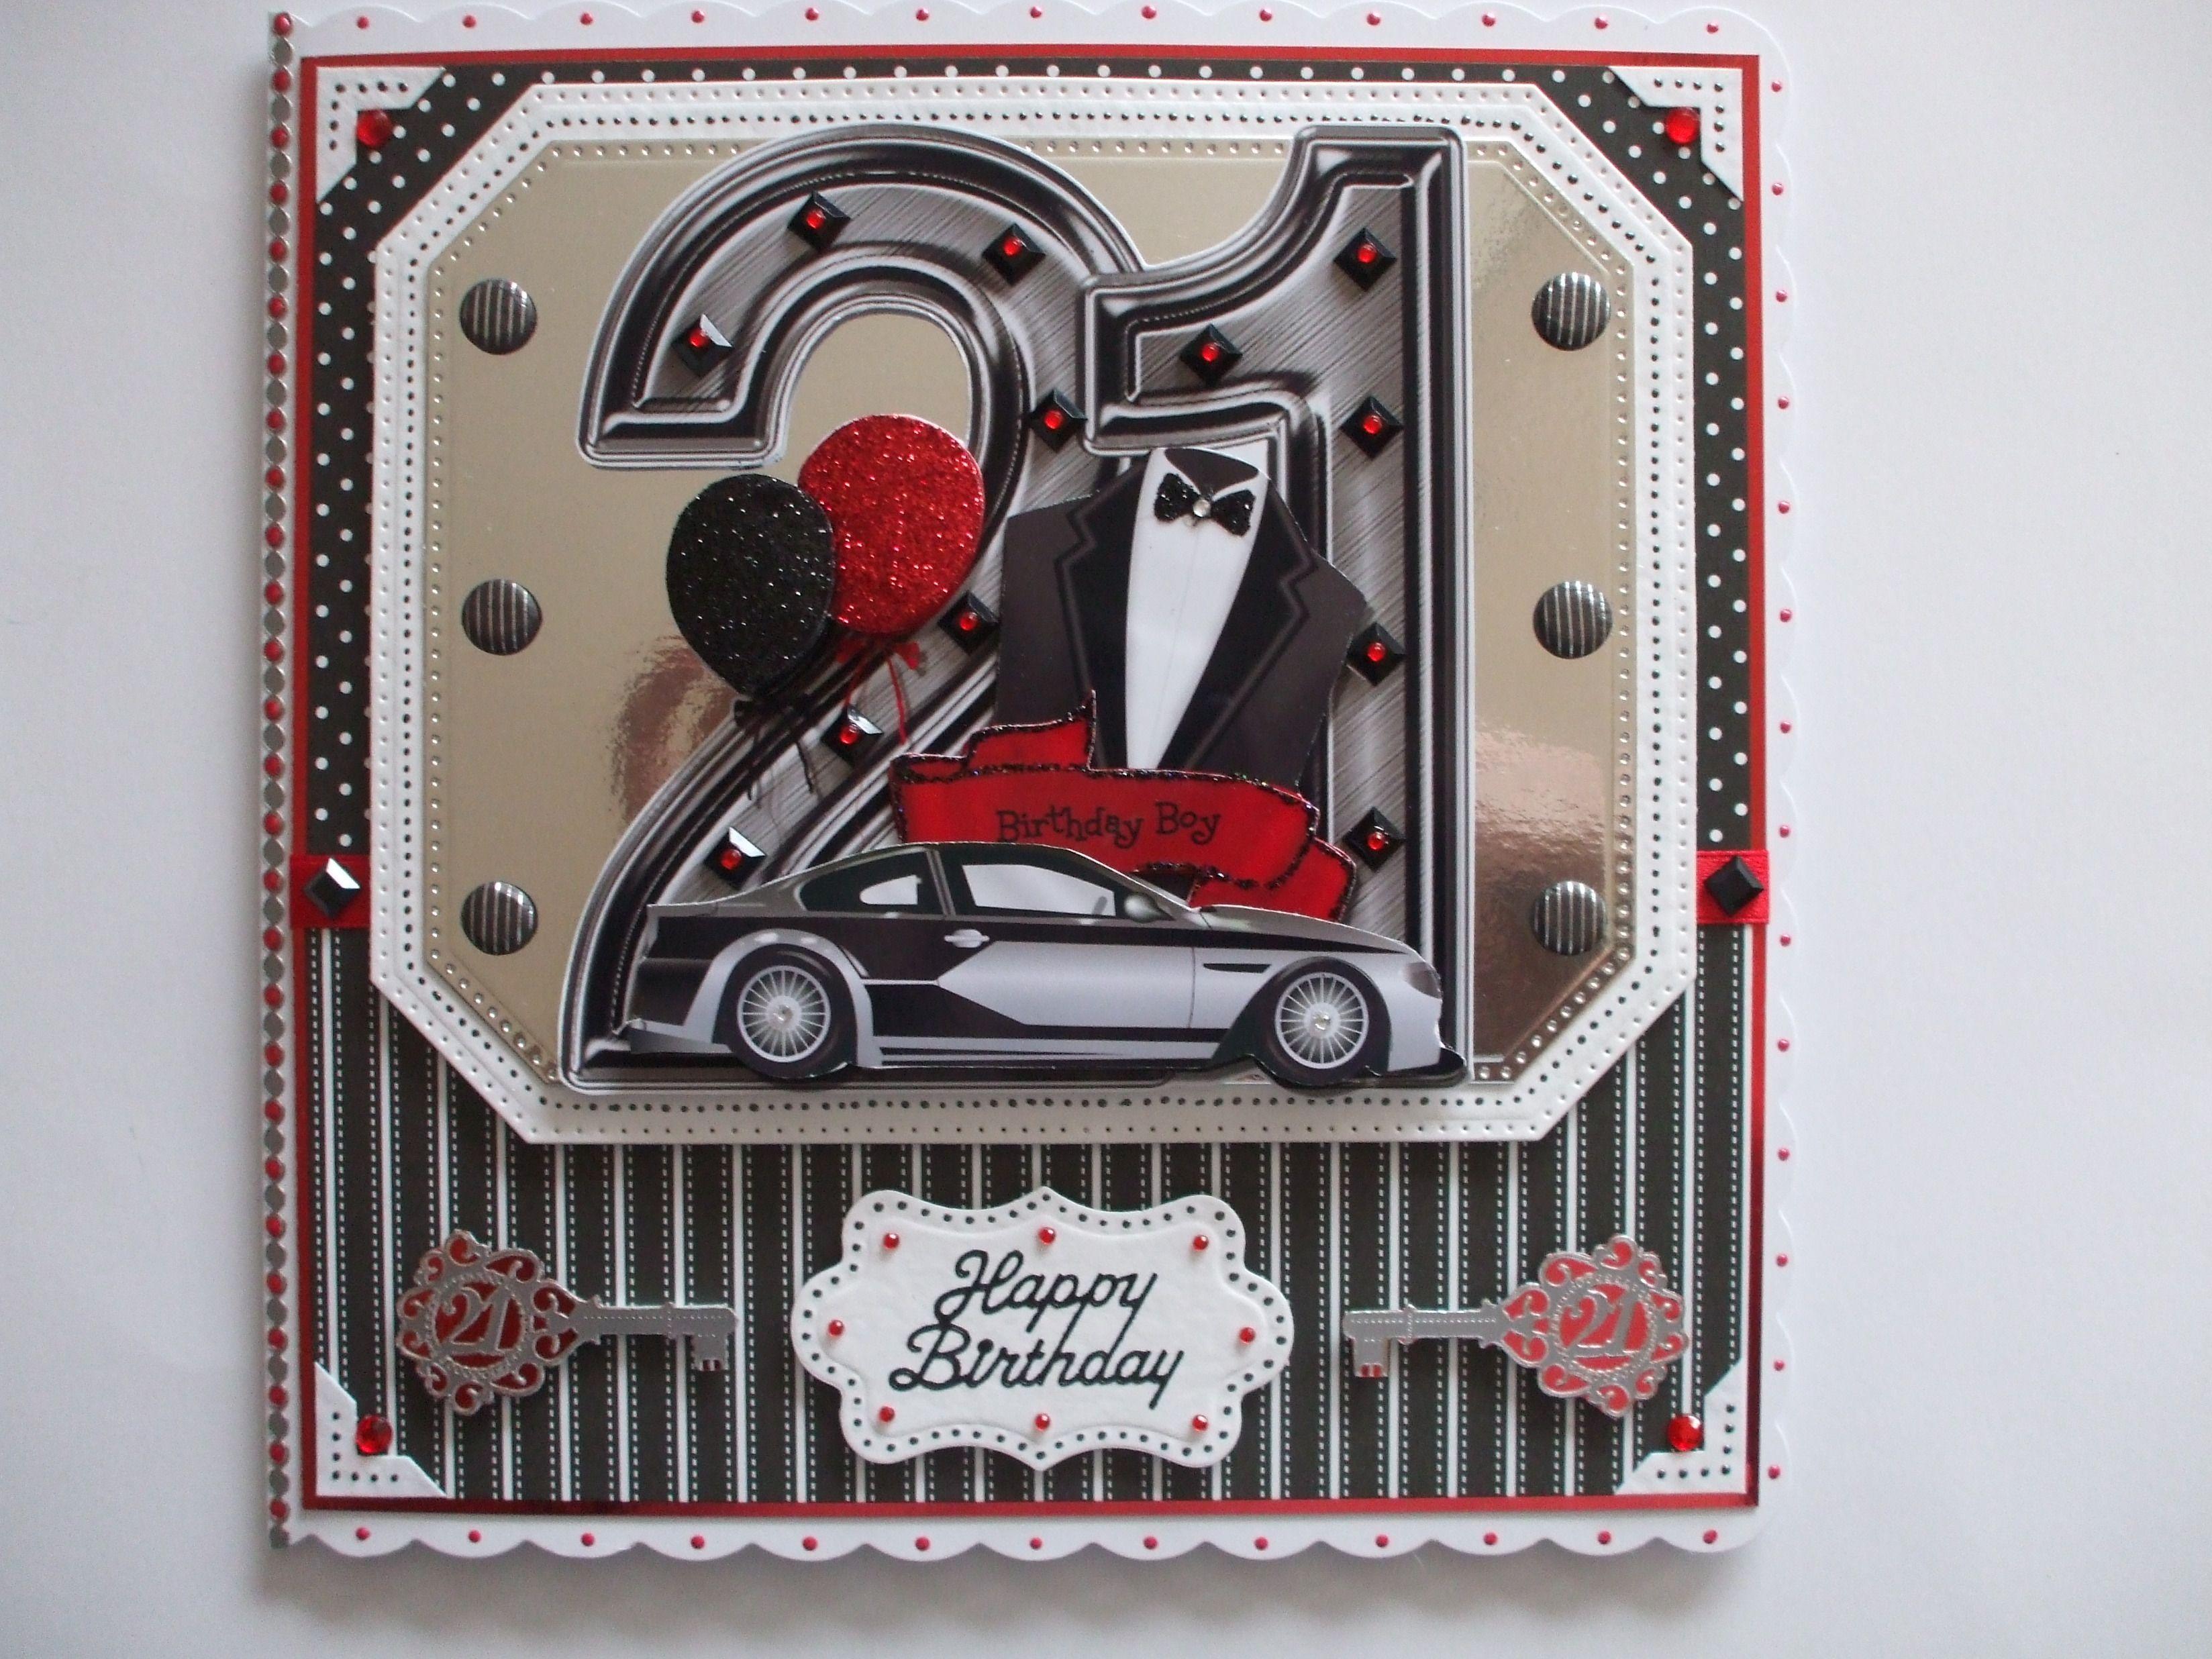 Handmade 21st Birthday Card For Male 21st Birthday Cards Masculine Birthday Cards 21st Birthday Quotes